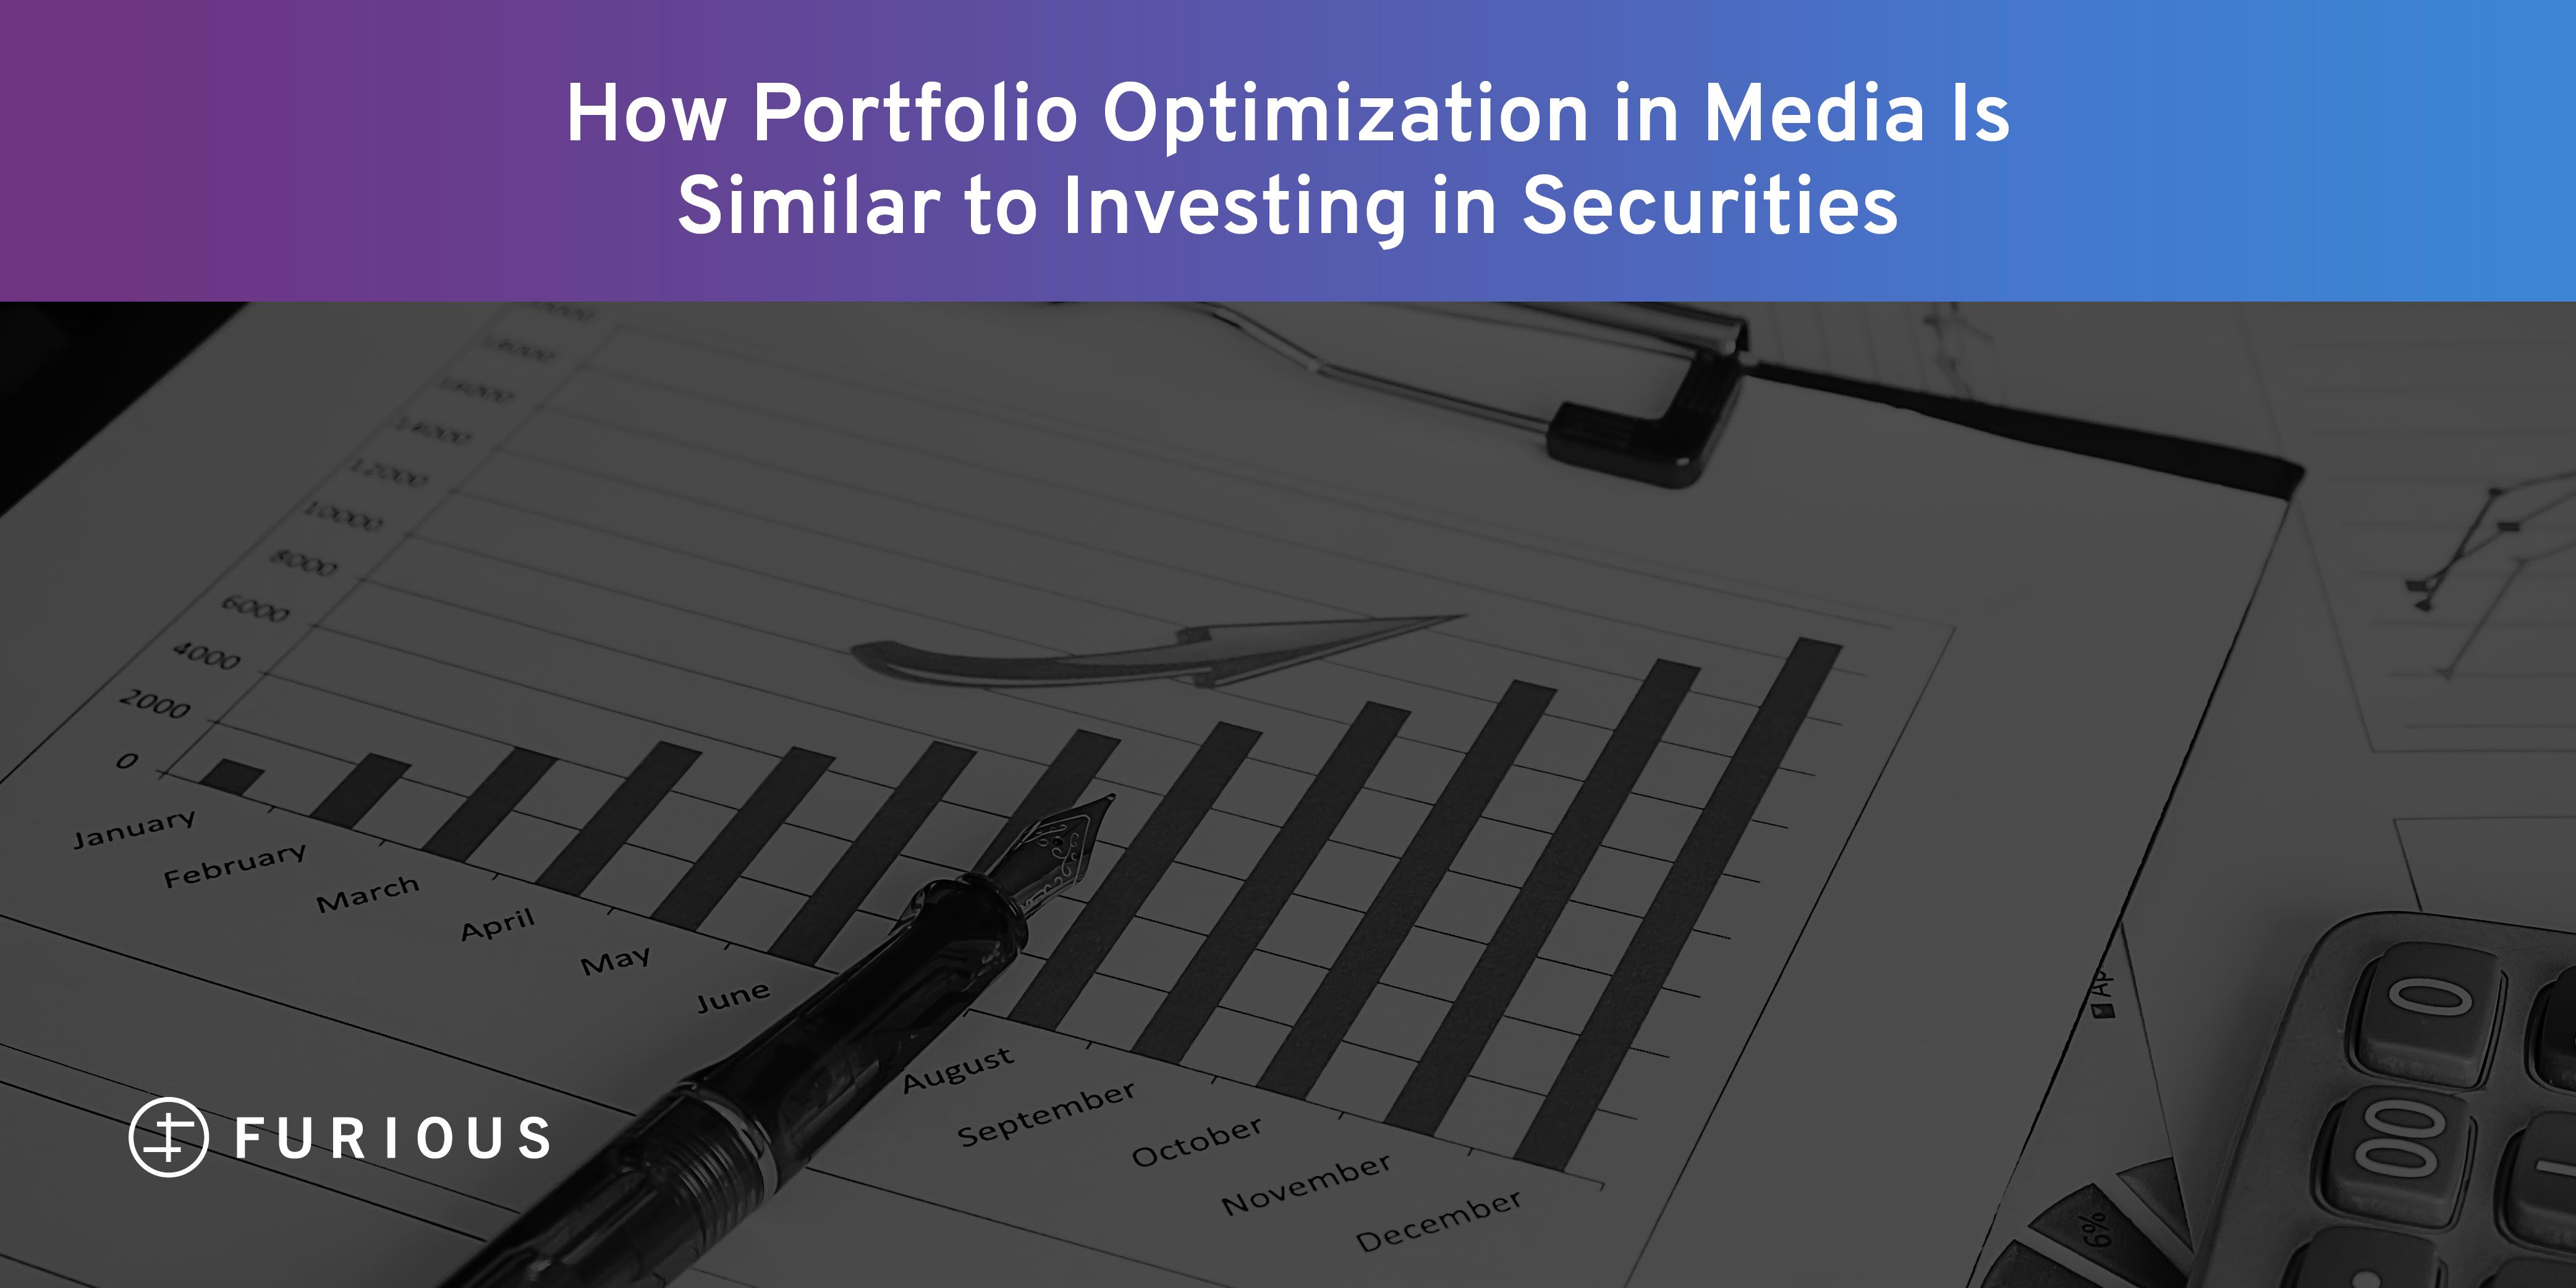 How Portfolio Optimization in Media Is Similar to Investing in Securities